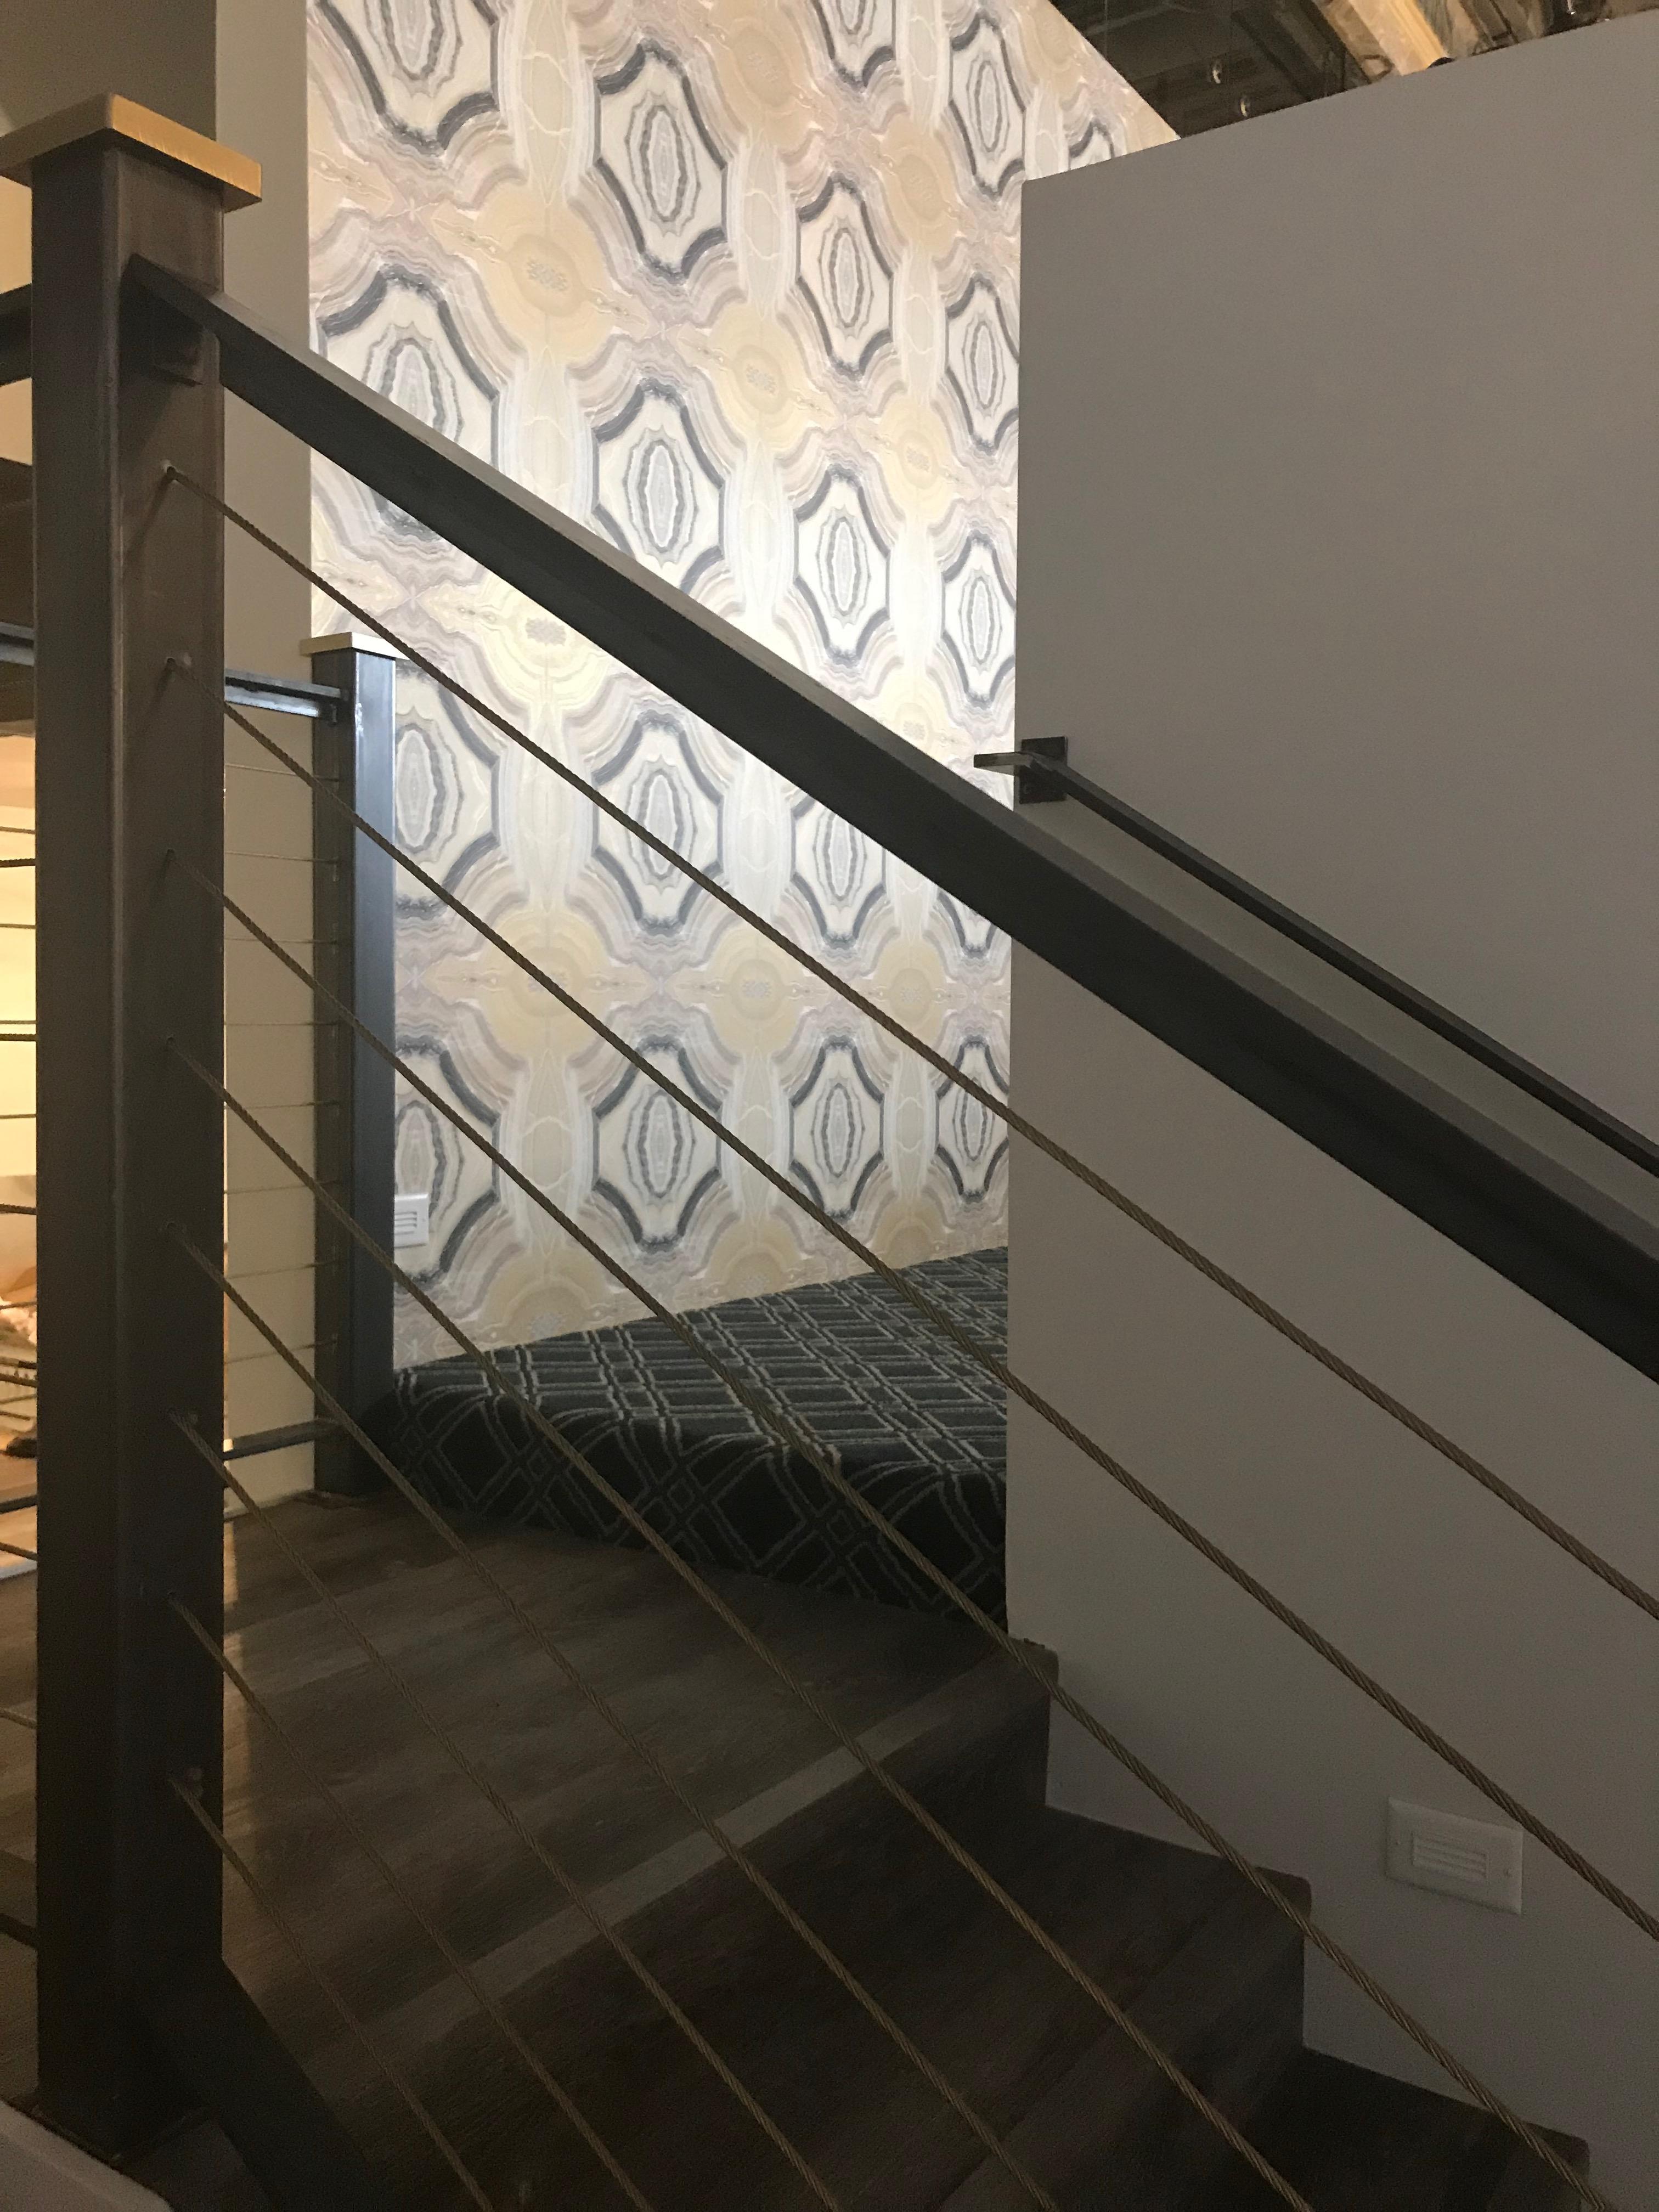 Third floor wallpaper/railing